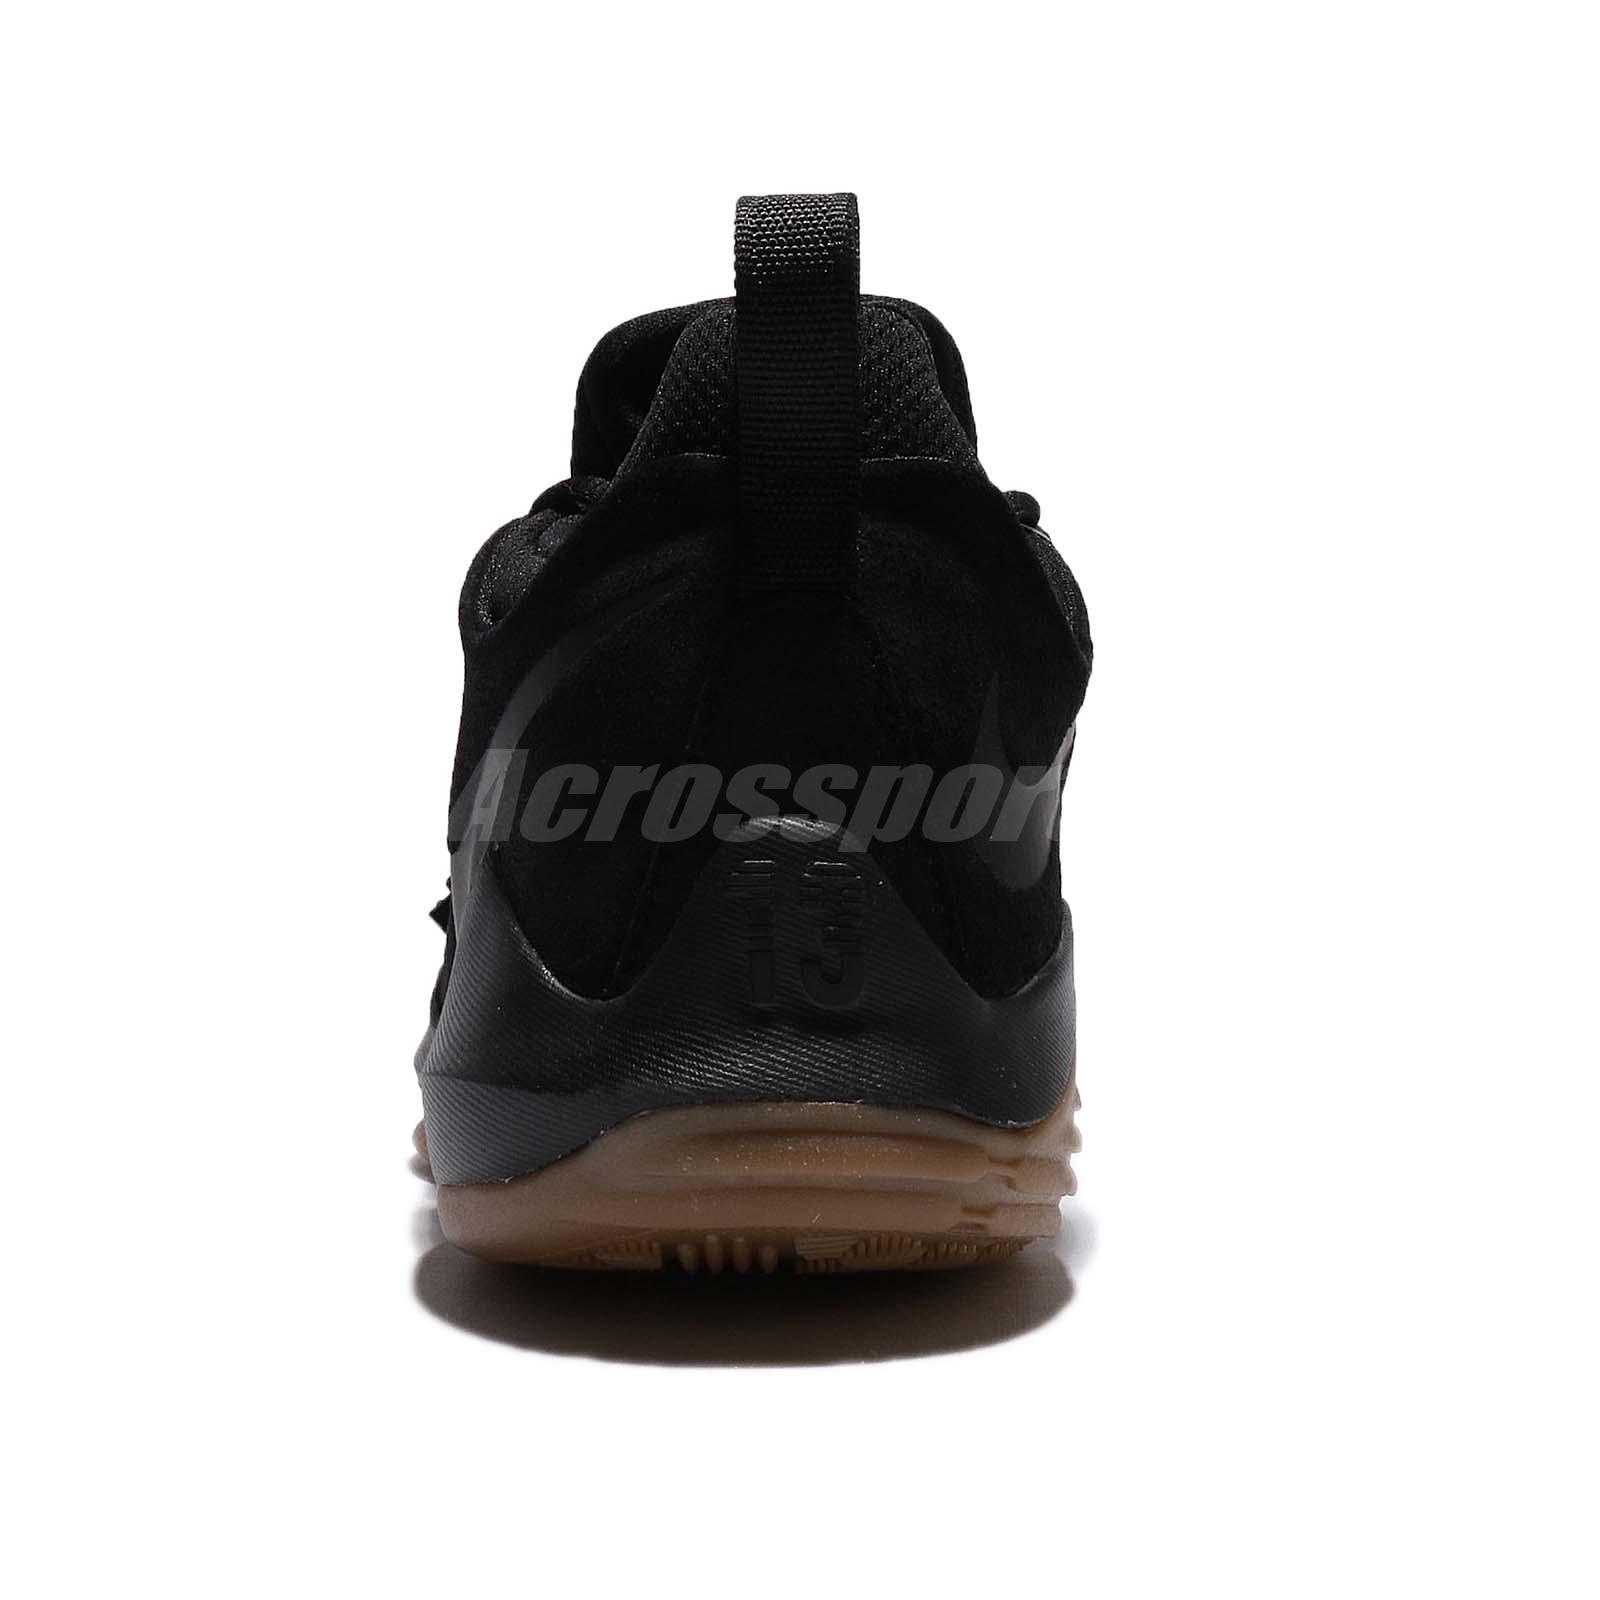 14ff1193f18 paul george shoes womens brown Sale